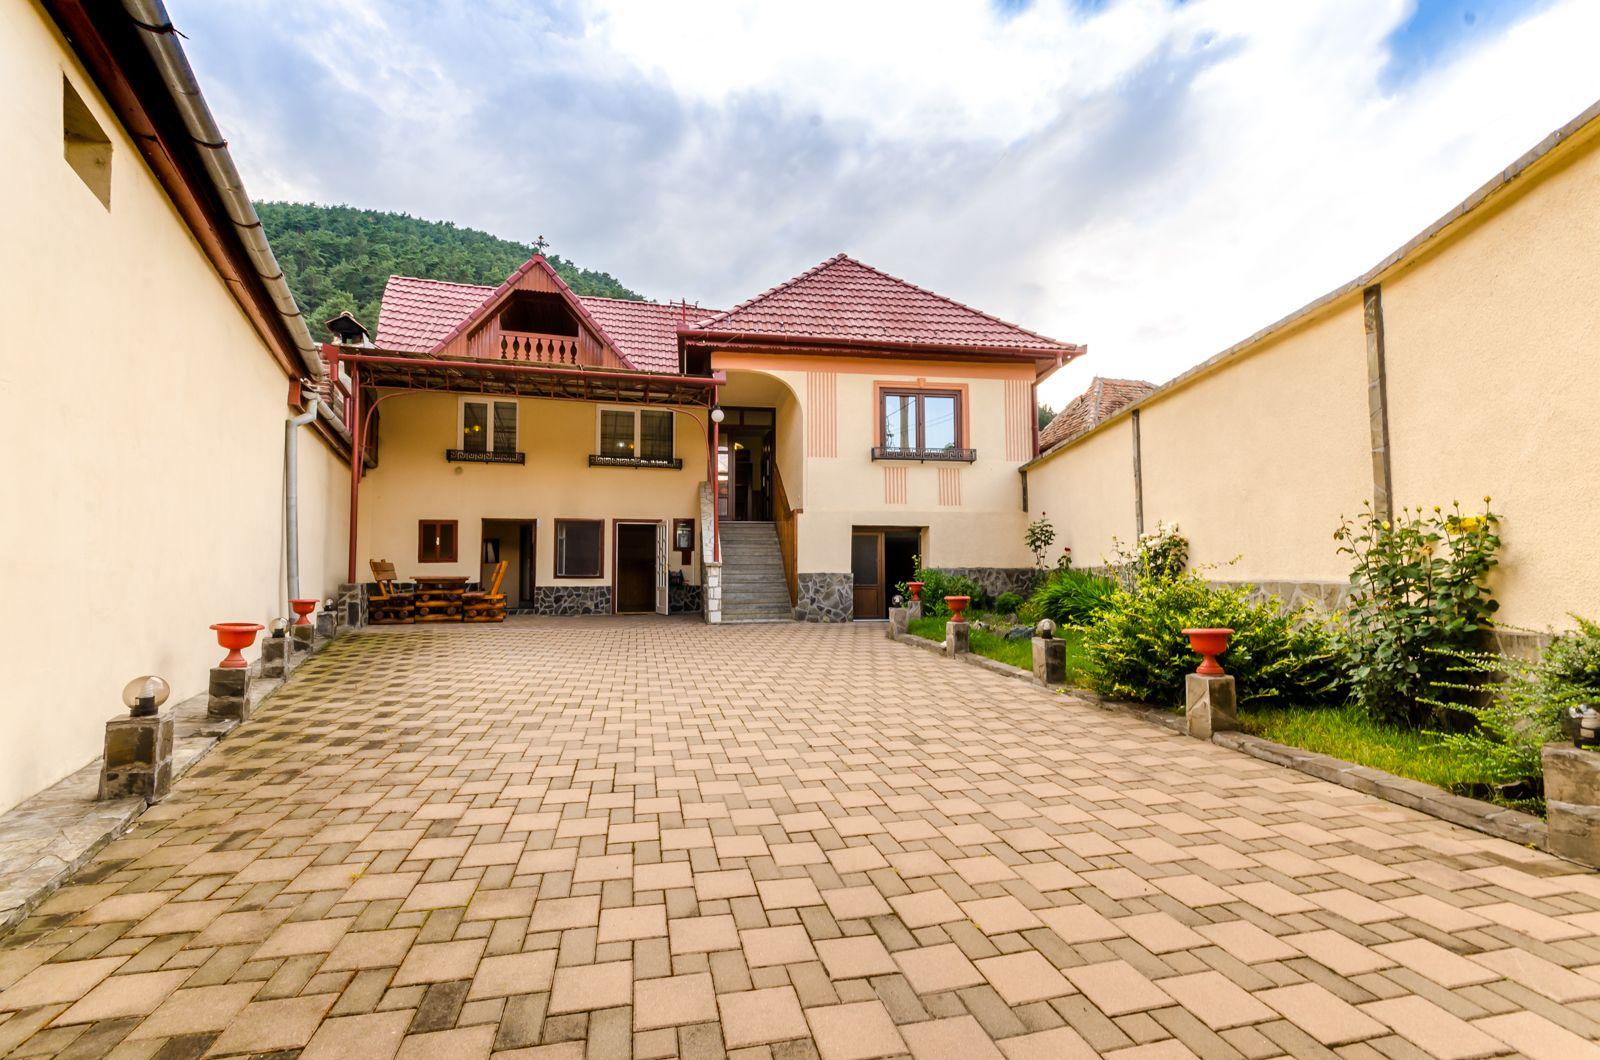 Casa renovata complet, 3 camere, 2 bai, 350mp, Centru Rasinari